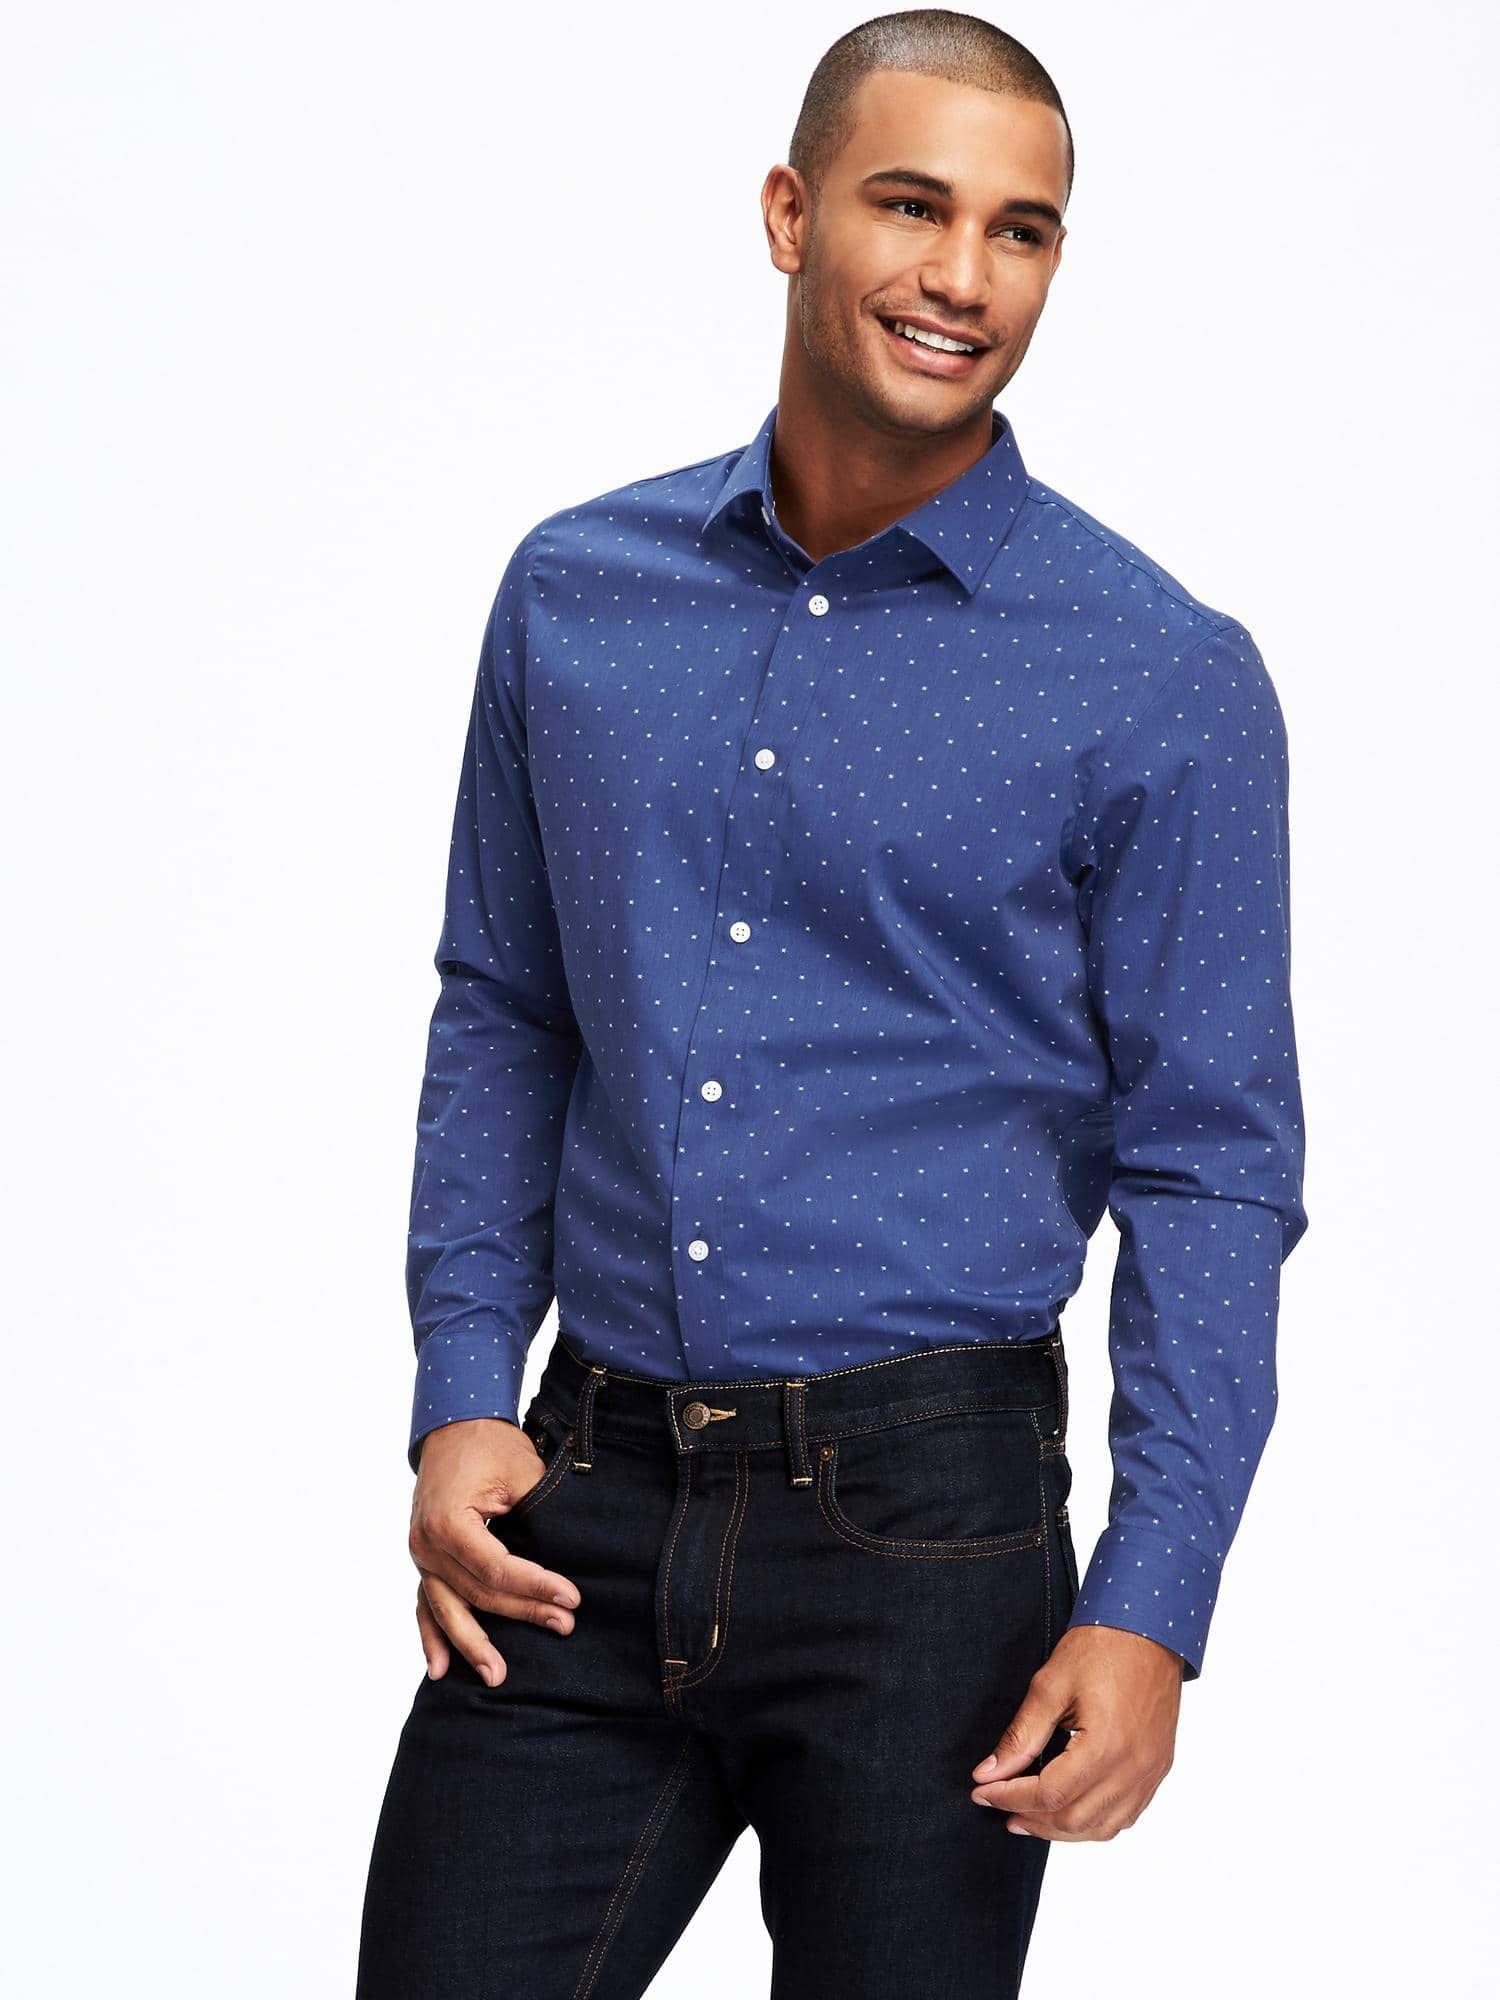 SlimFit BuiltIn Flex Signature NonIron Shirt for Men